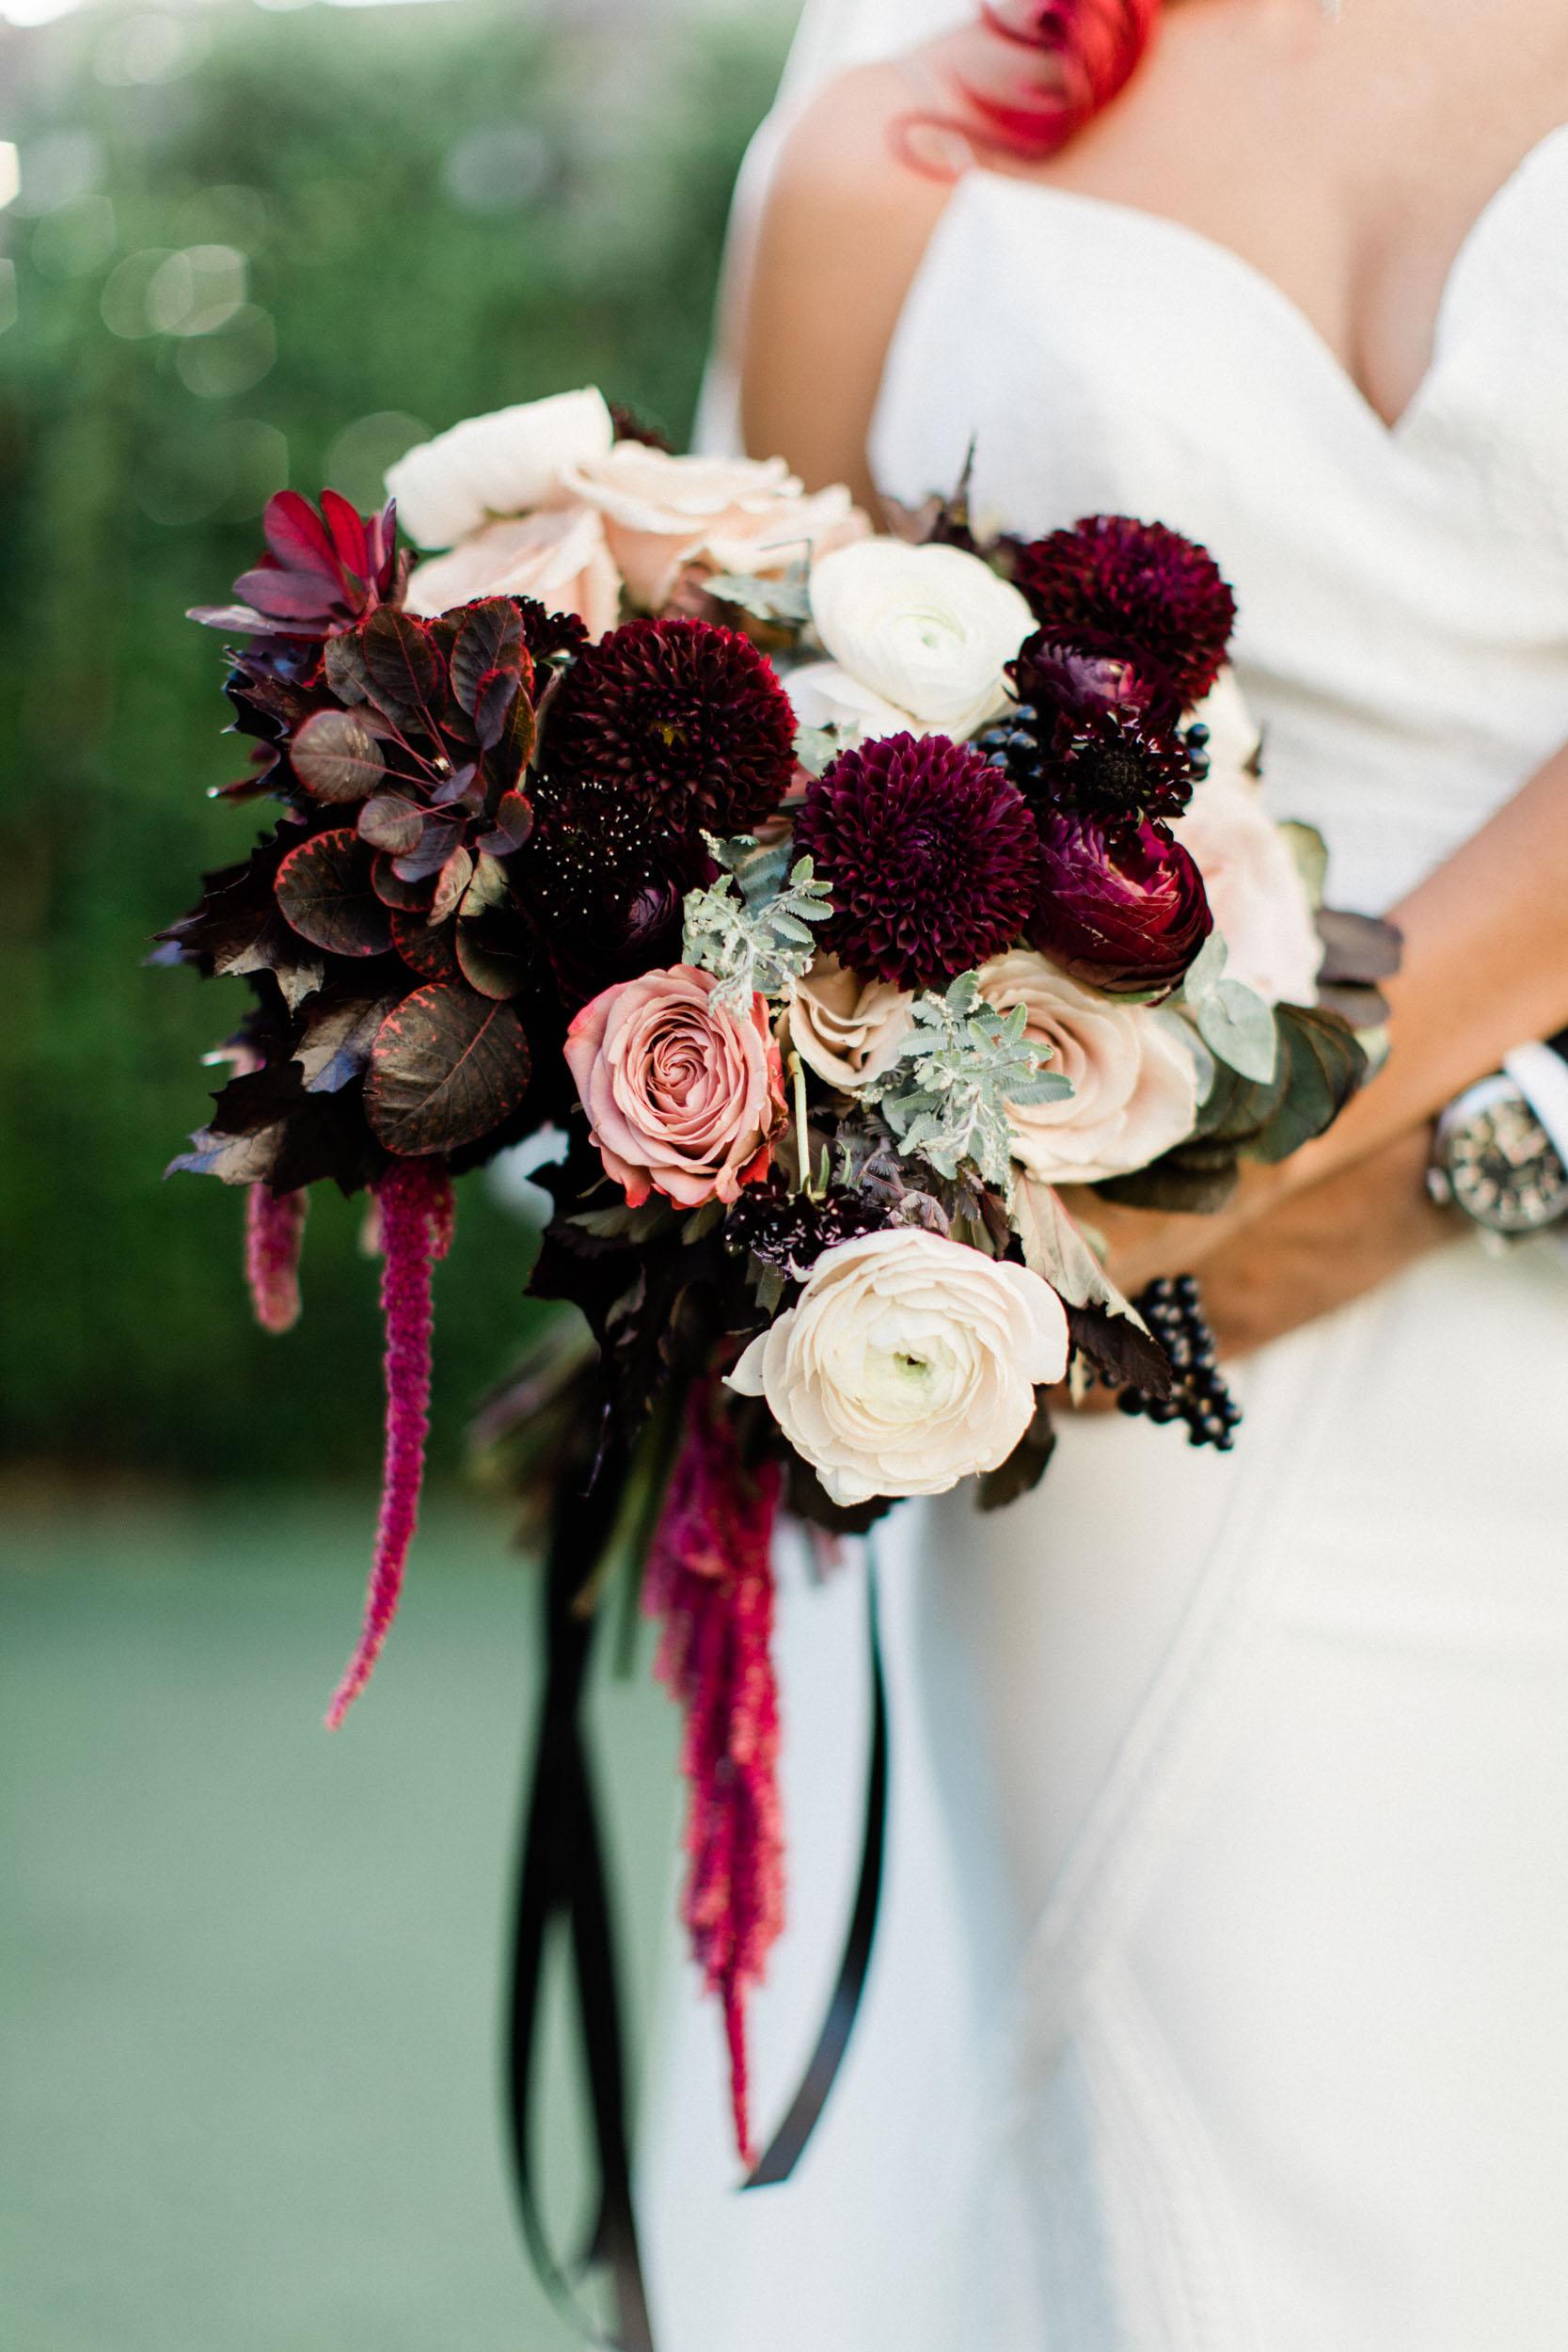 BKM-Photography-Los-Angeles-Highland-Park-York-Manor-Wedding-Photography-0814.jpg